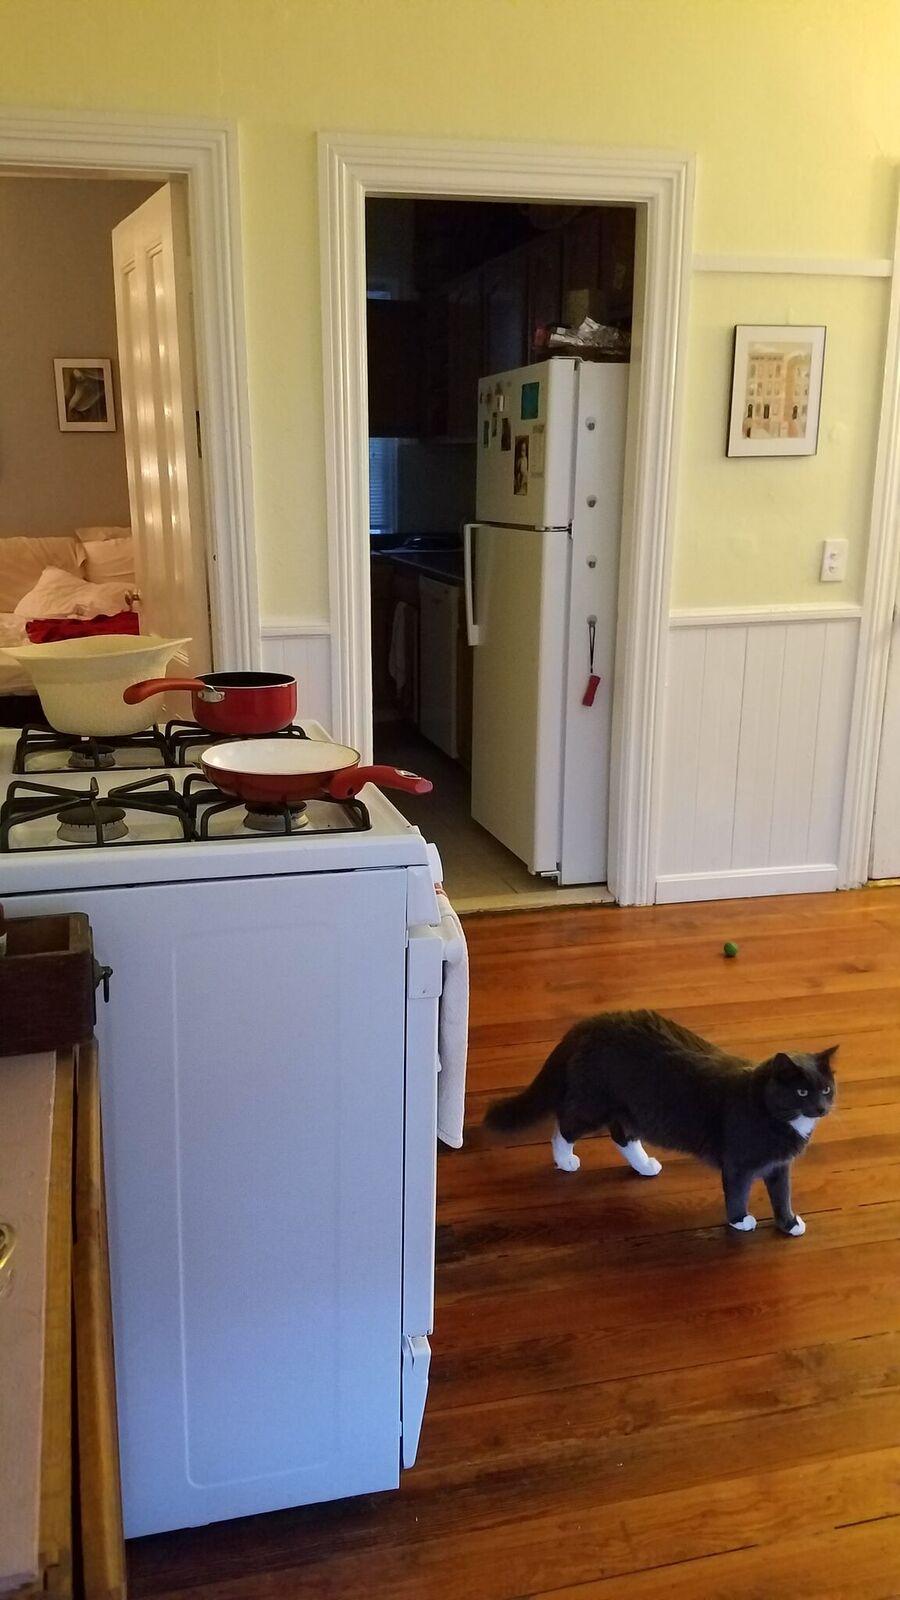 Kitchen and Greyson.jpeg